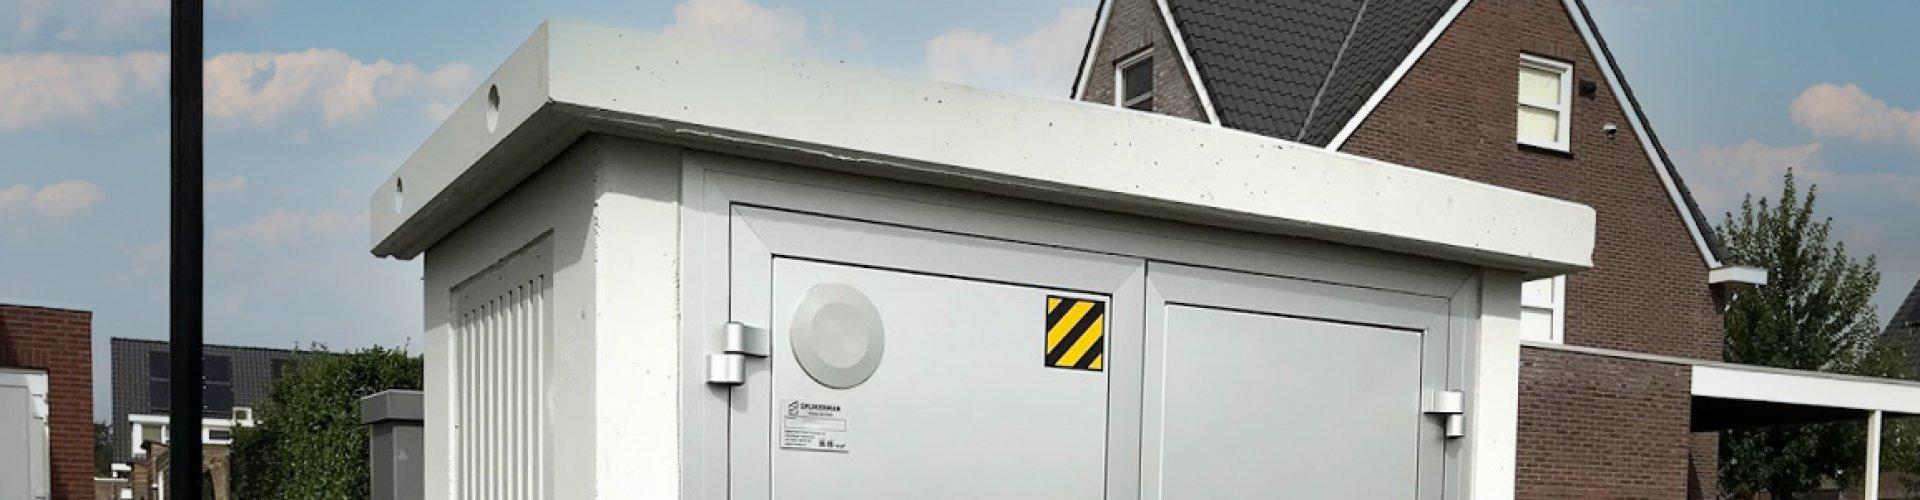 compactstation